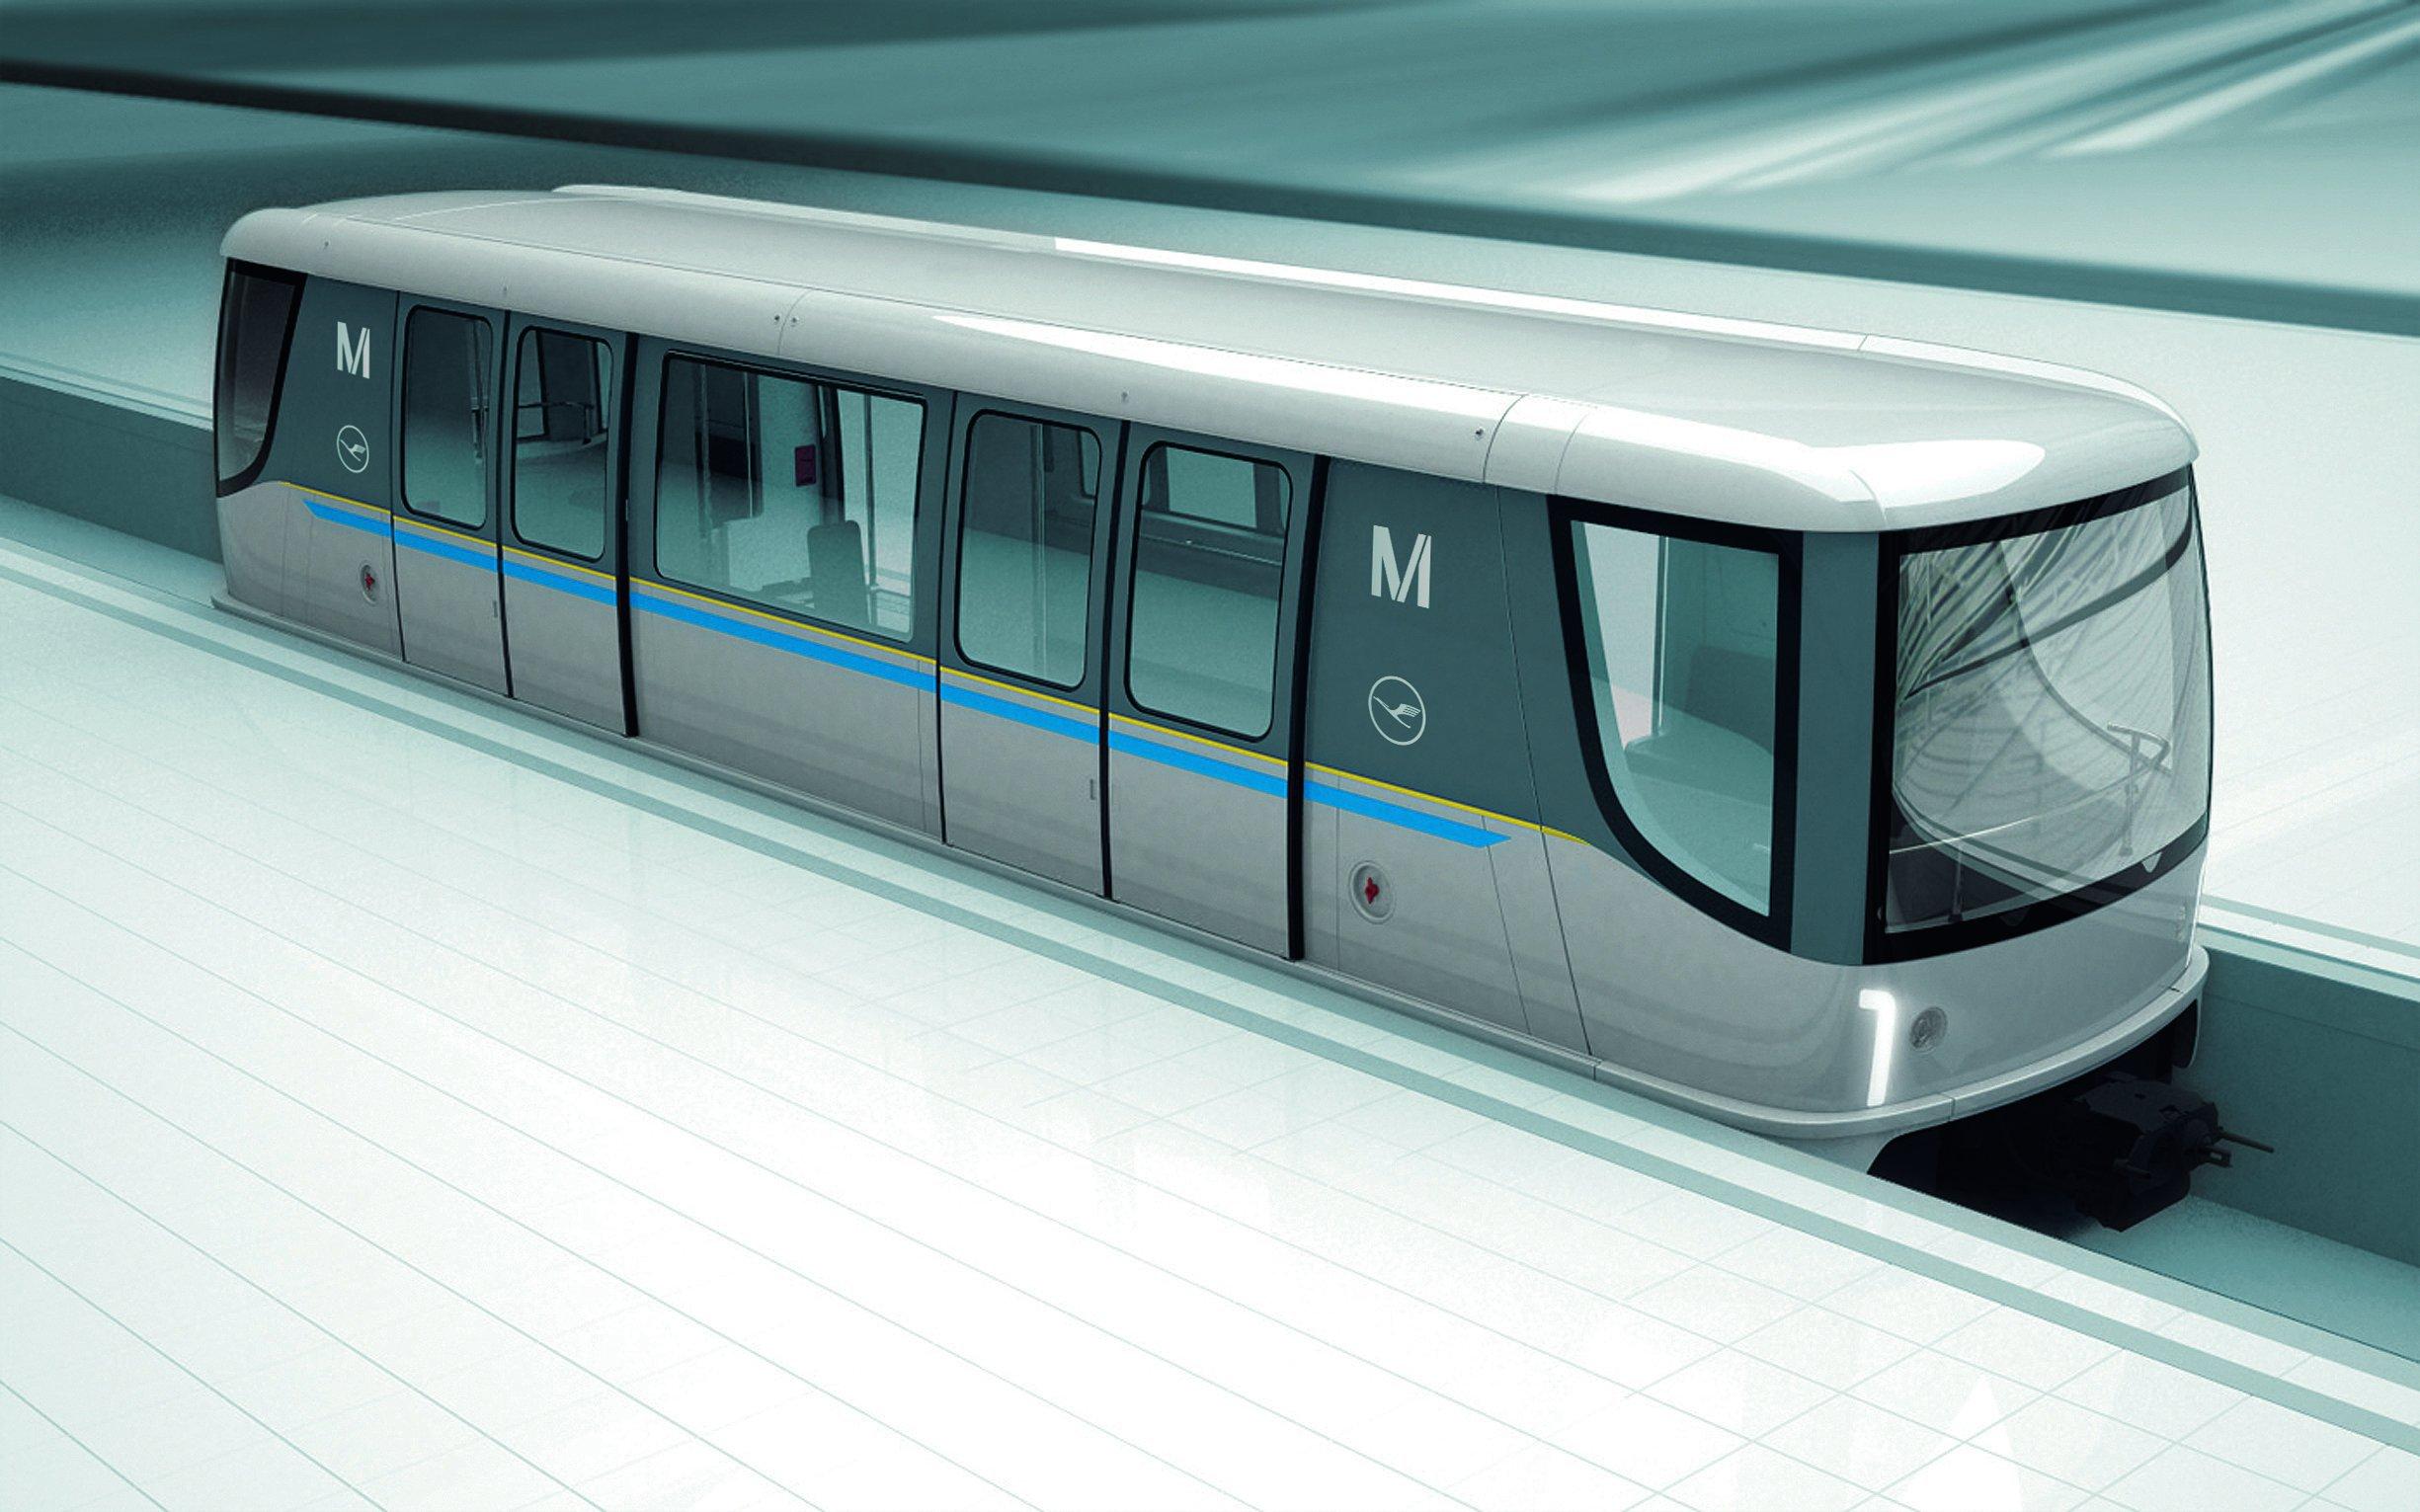 Passenger_Transport_System